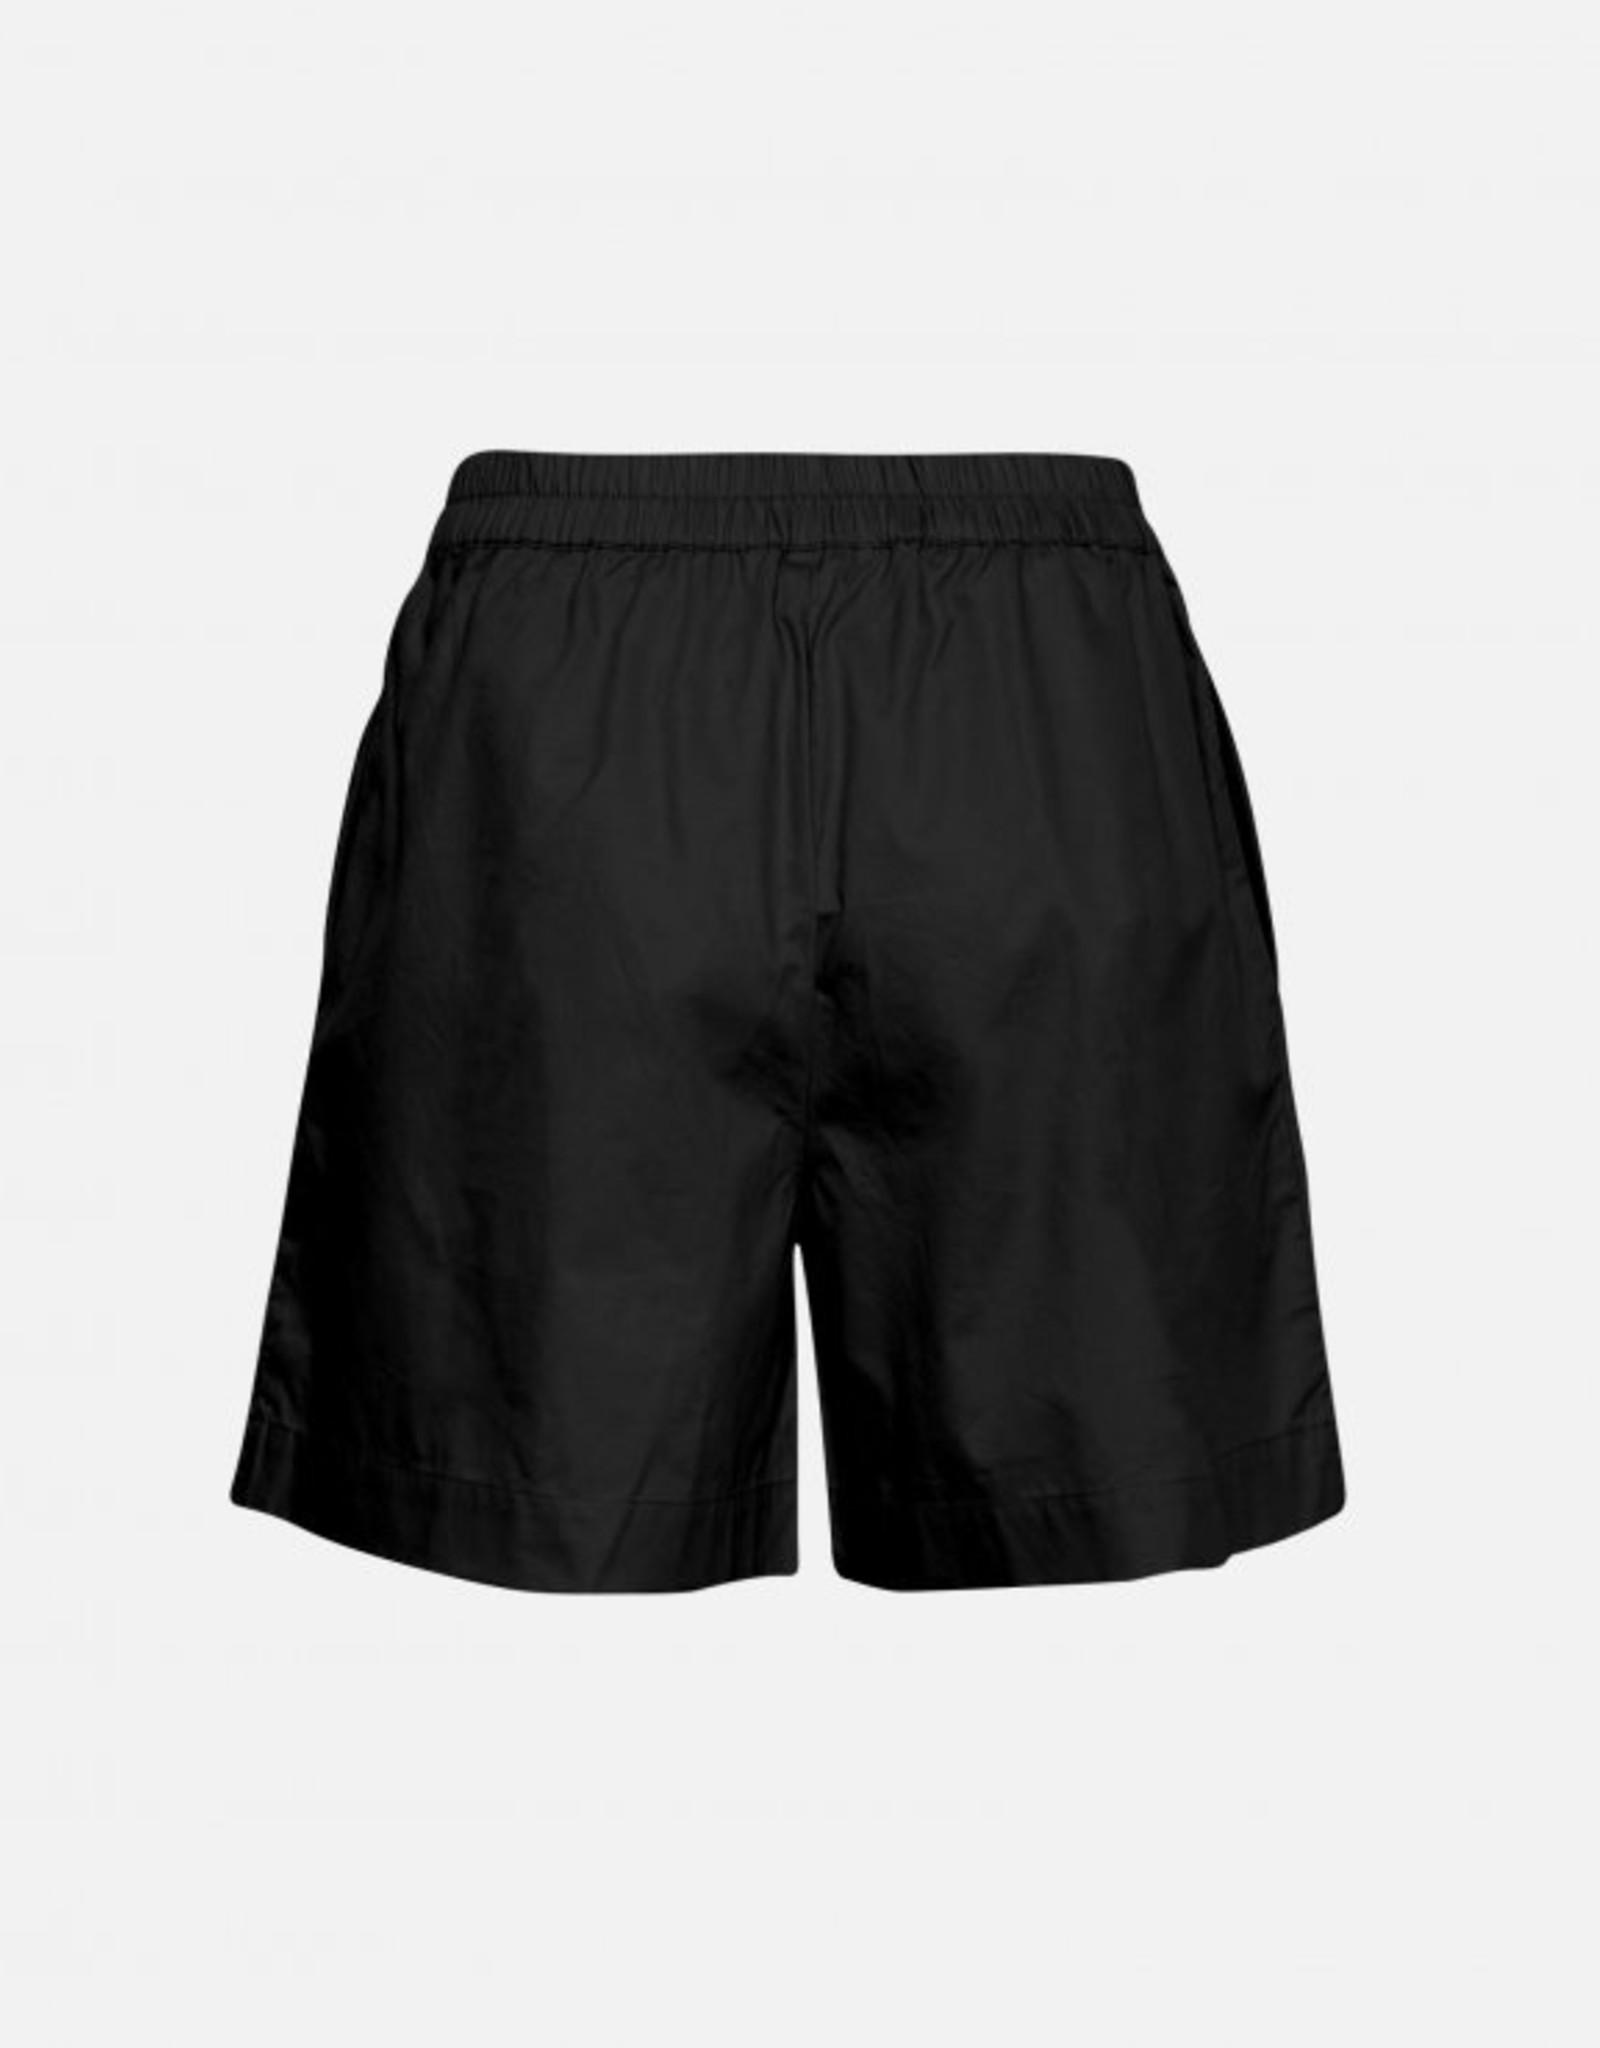 Moss Copenhagen Imona Shorts Black